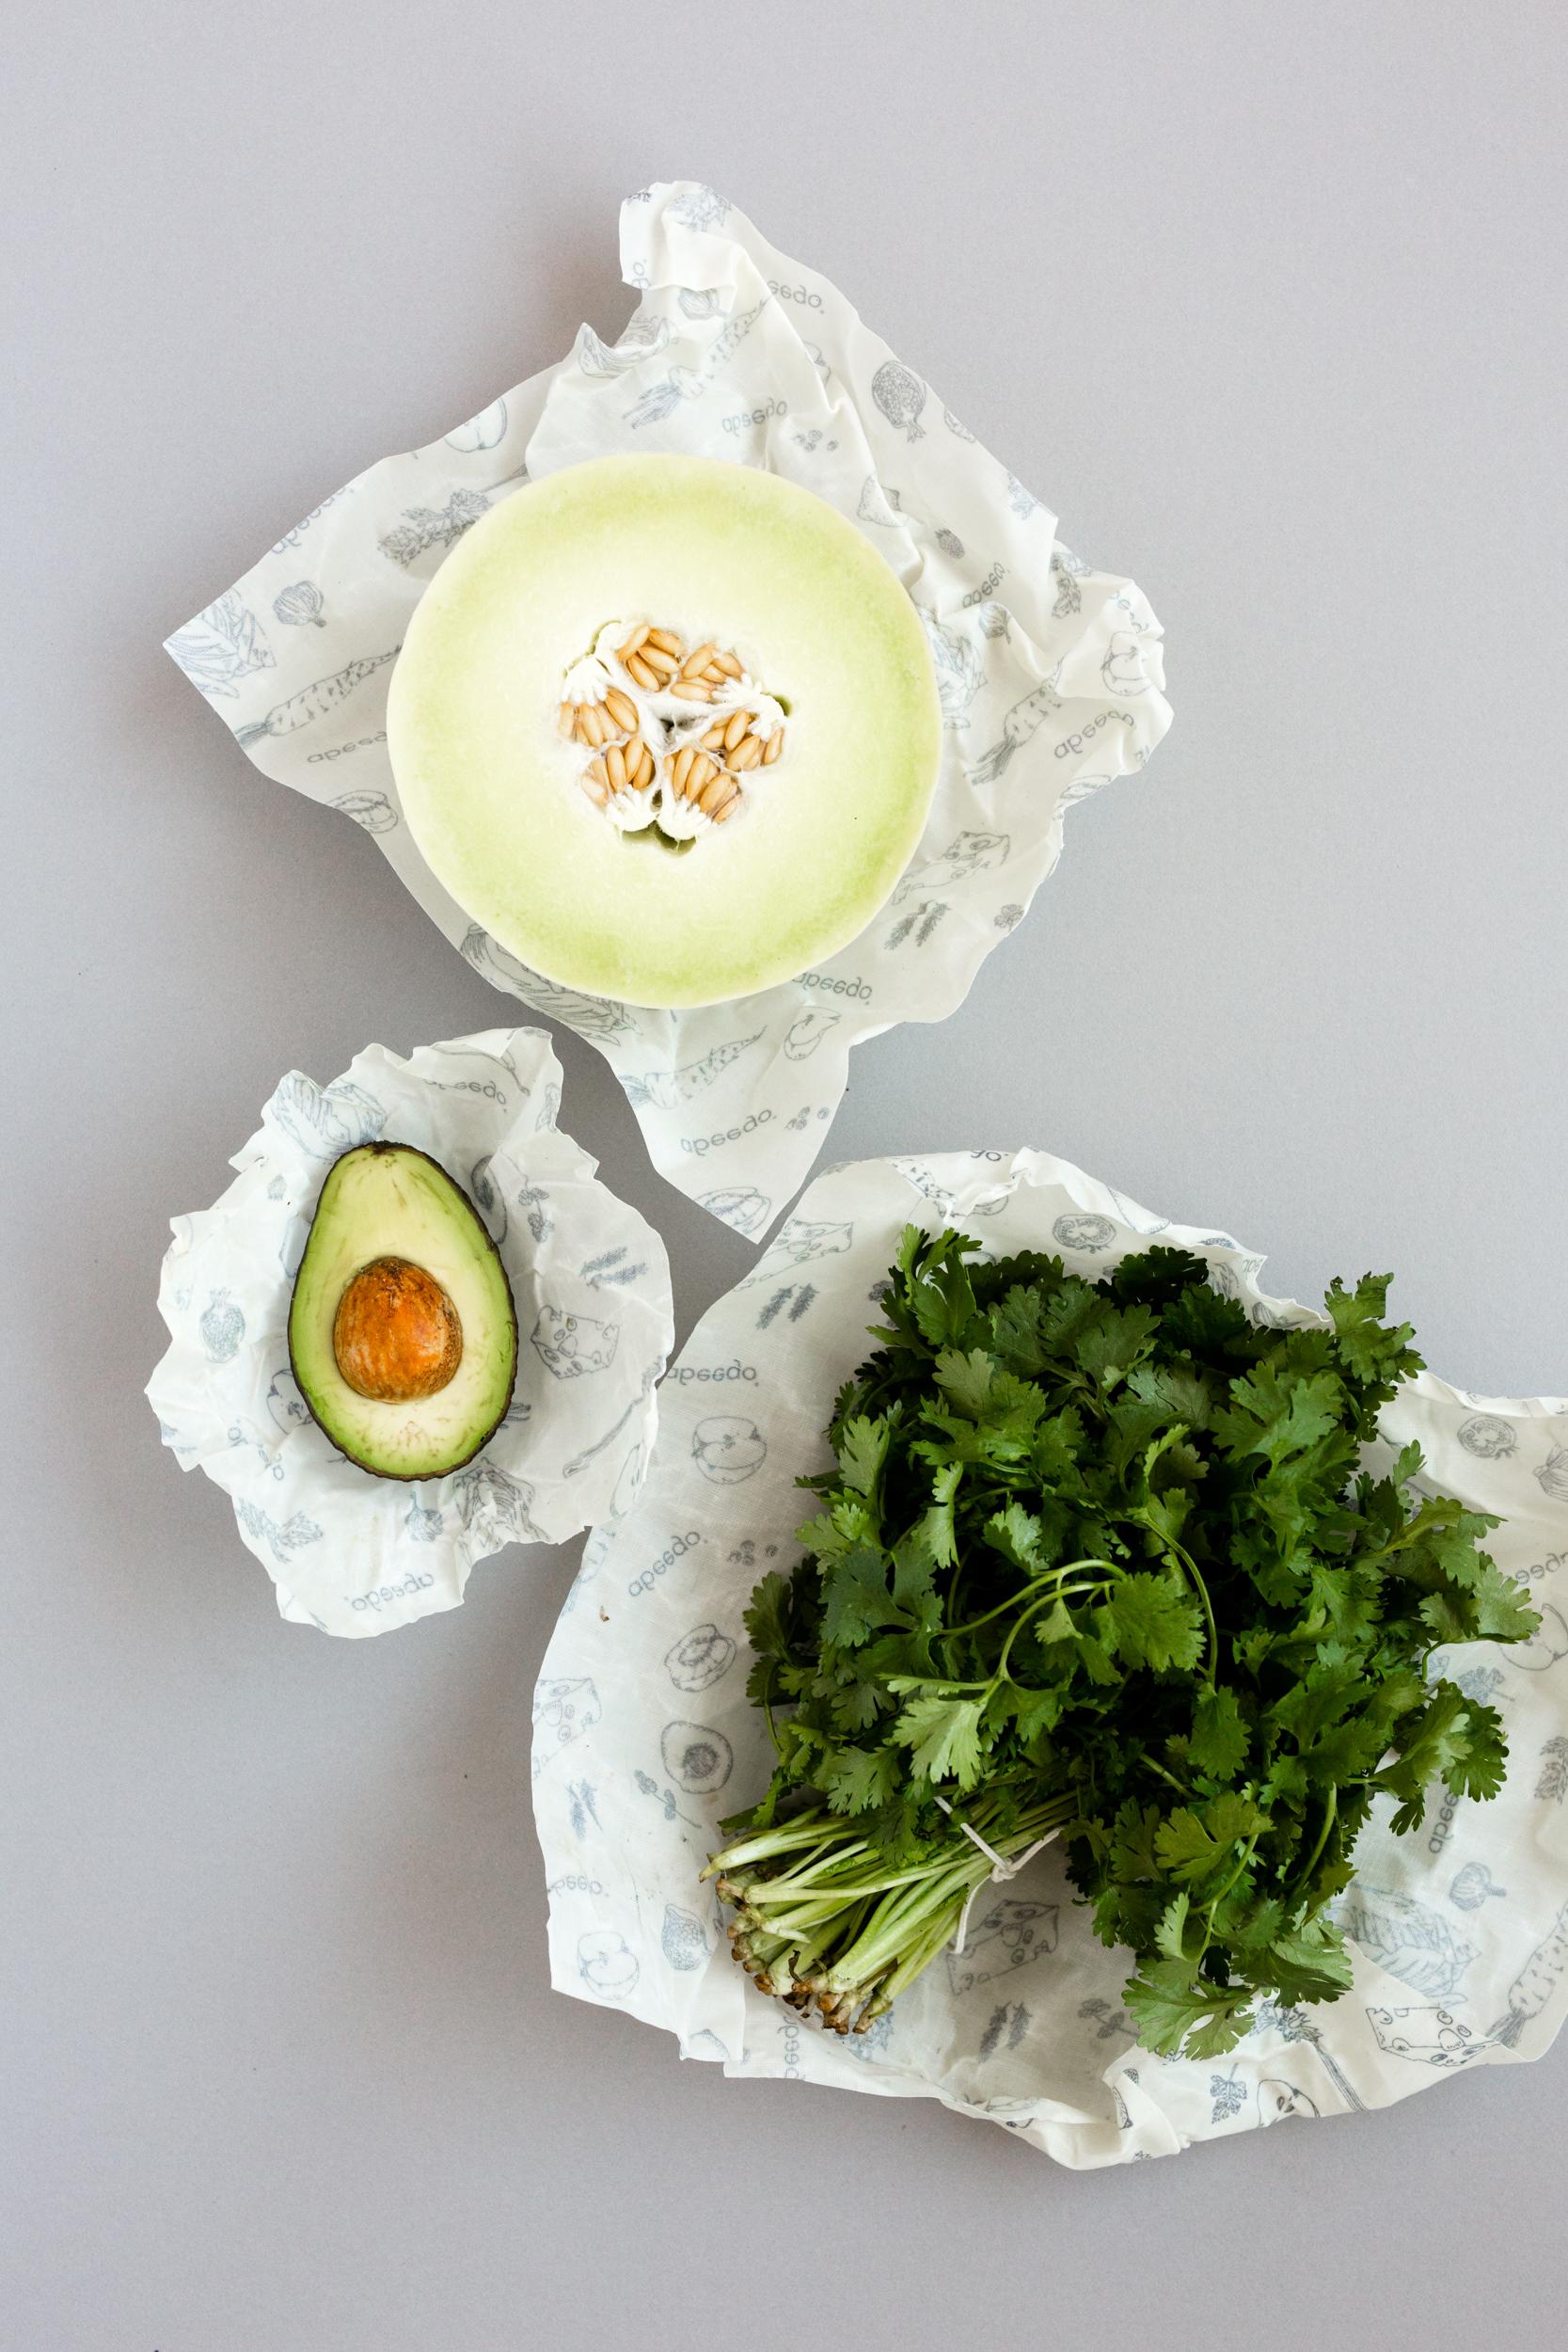 abeego-beeswax-wrap-cilantro-variety-1.jpg